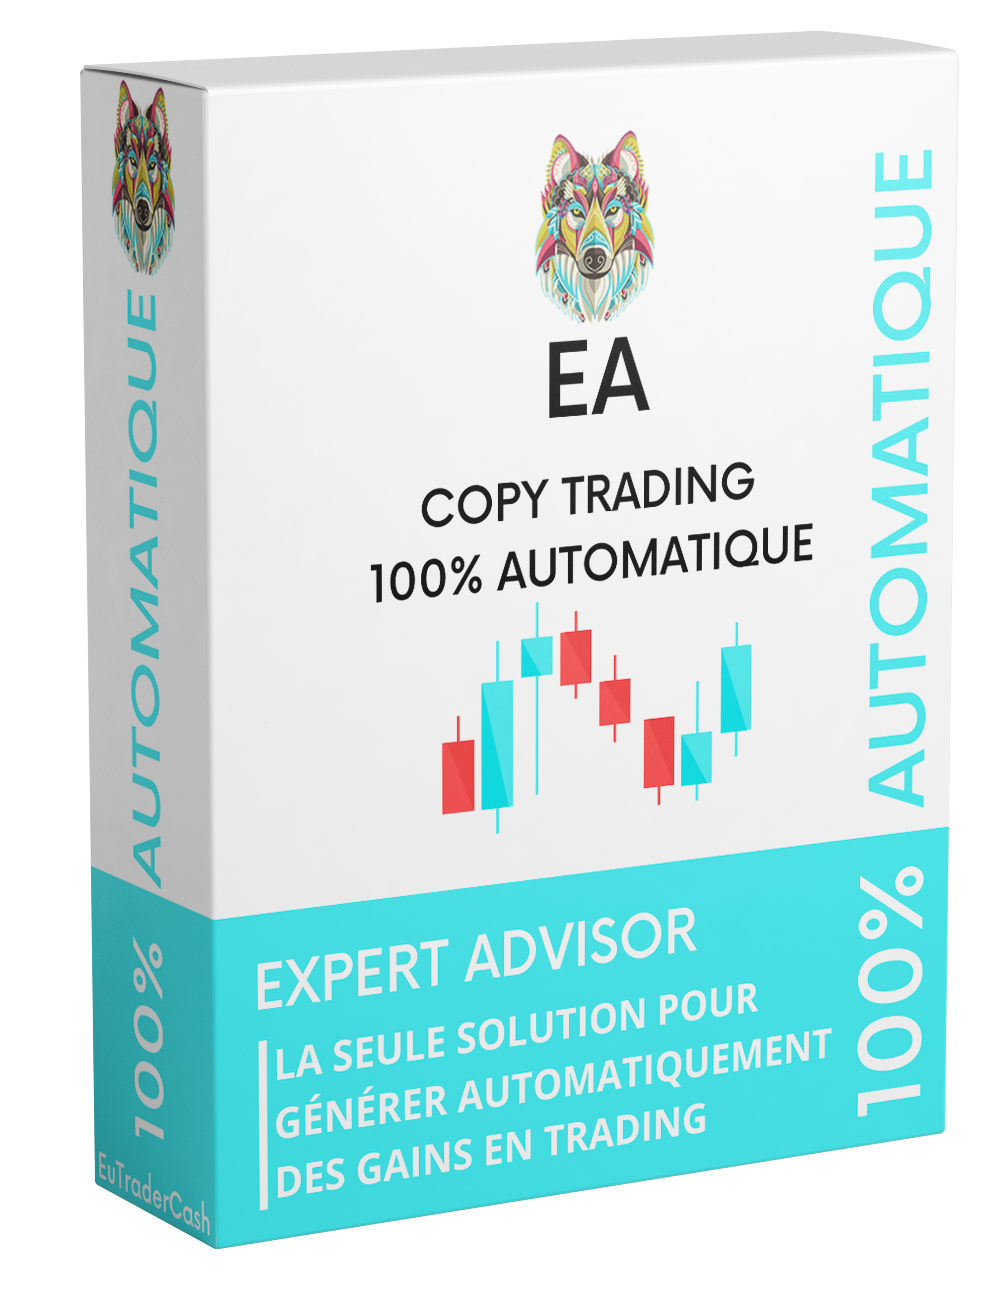 Copy Trading Automatique EA EuTraderCash